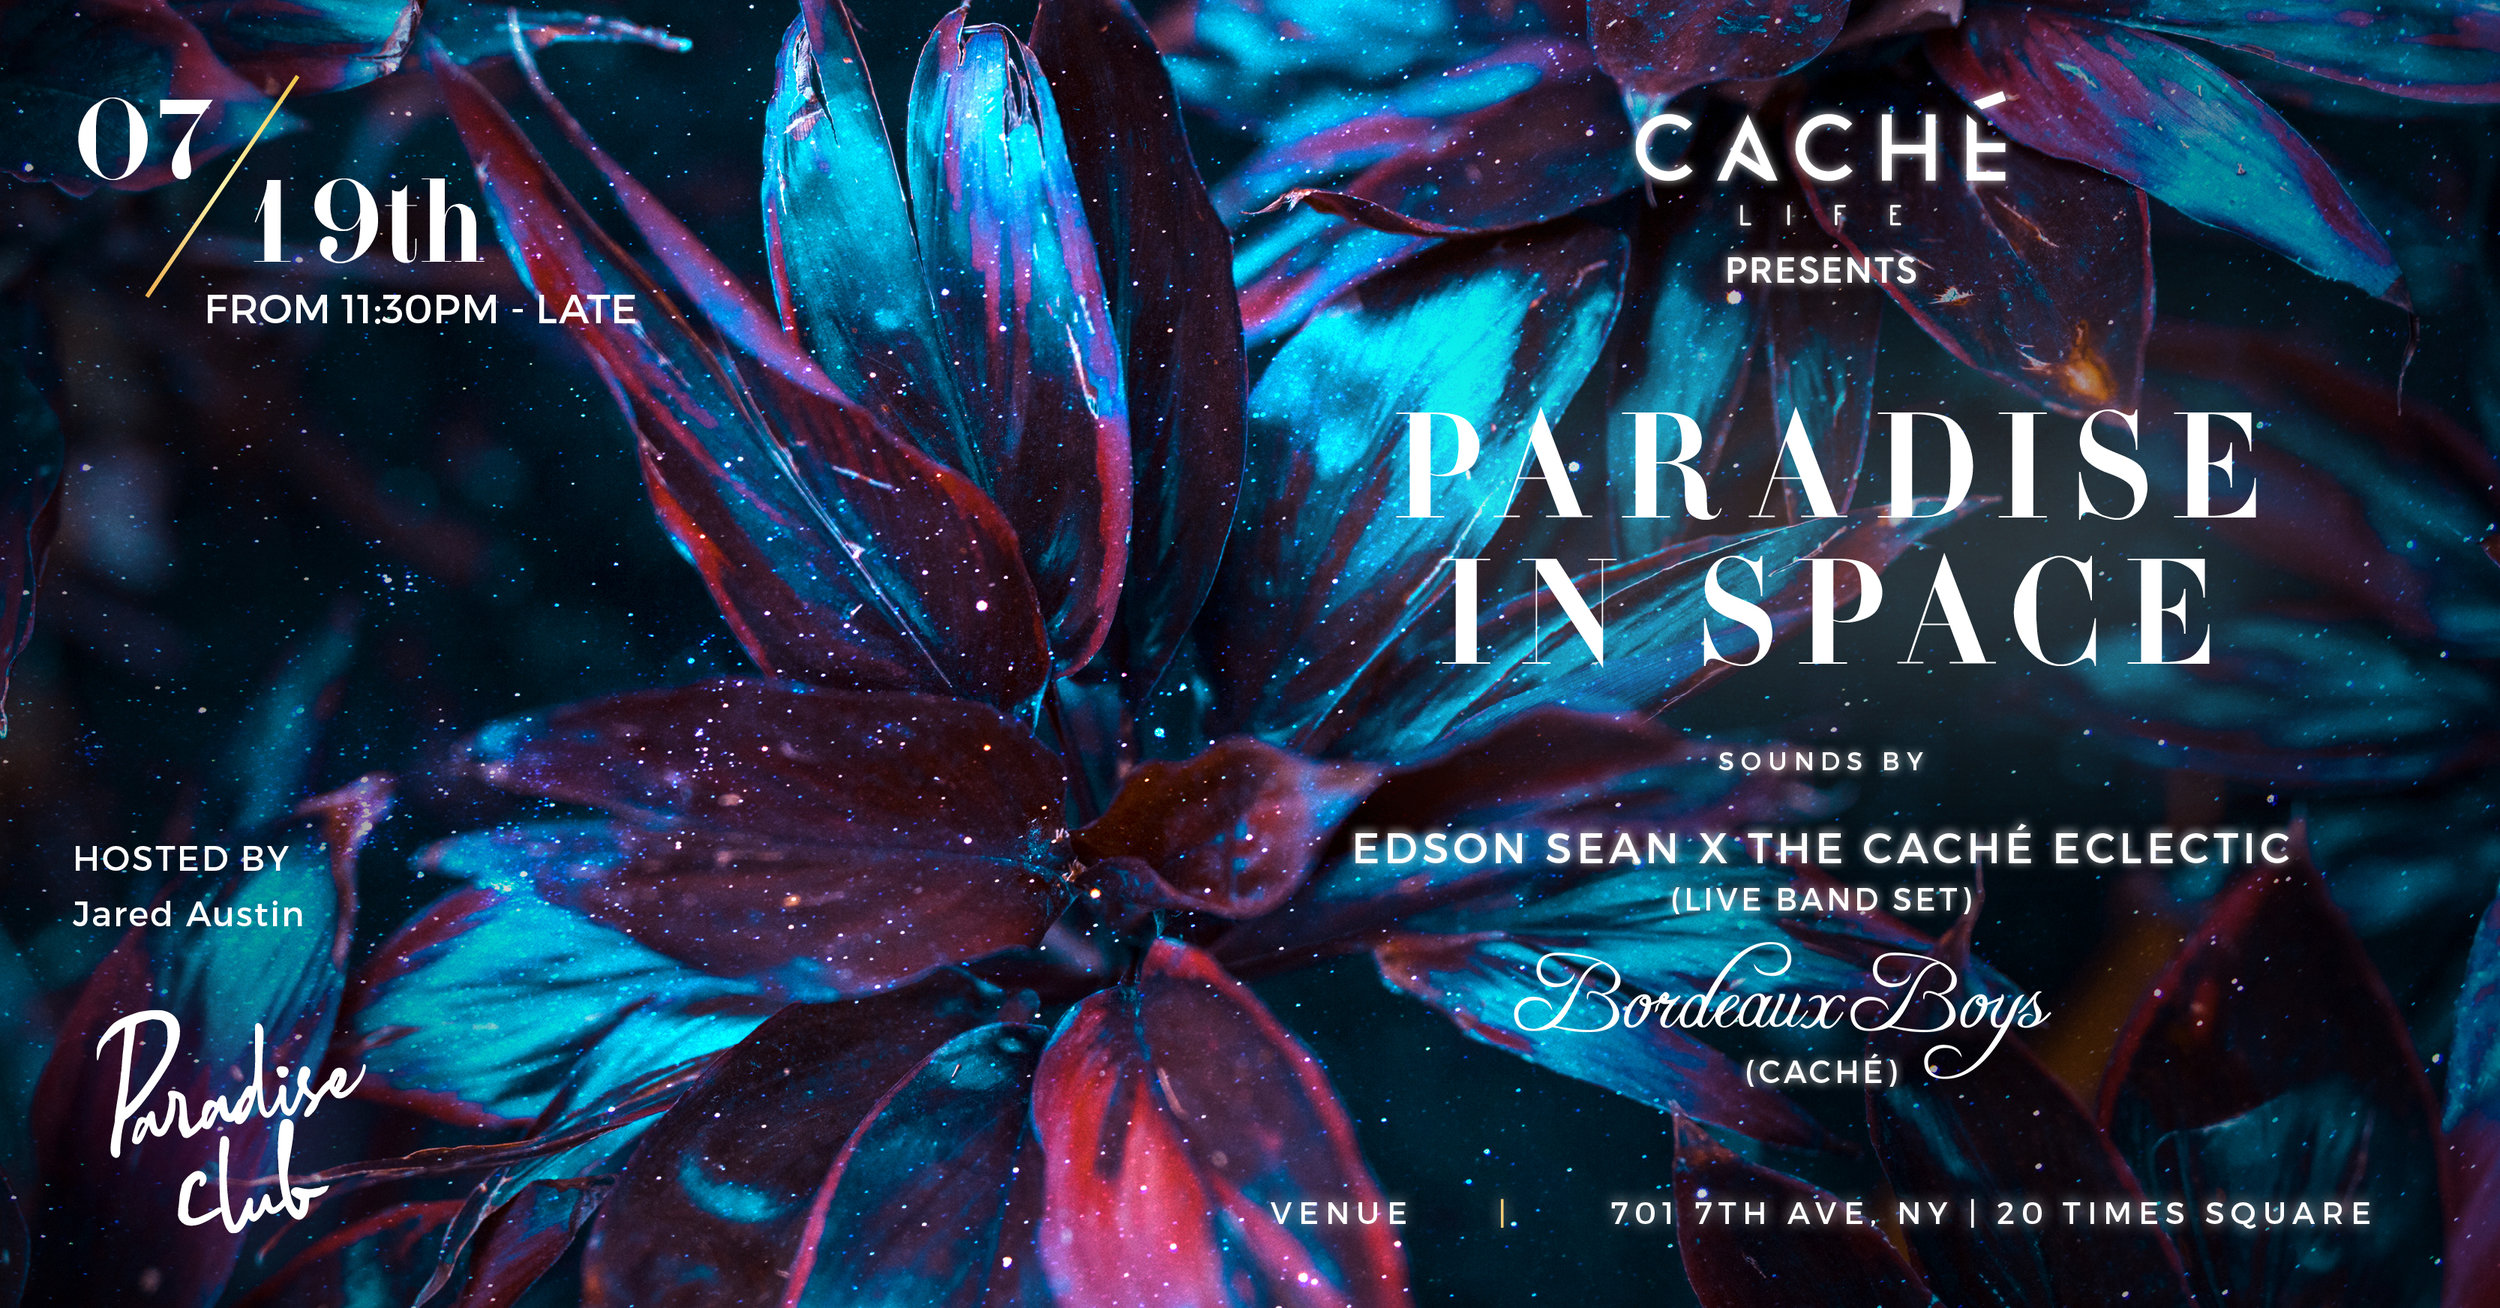 cache_1907_2019_paradise_paradise_club.jpg